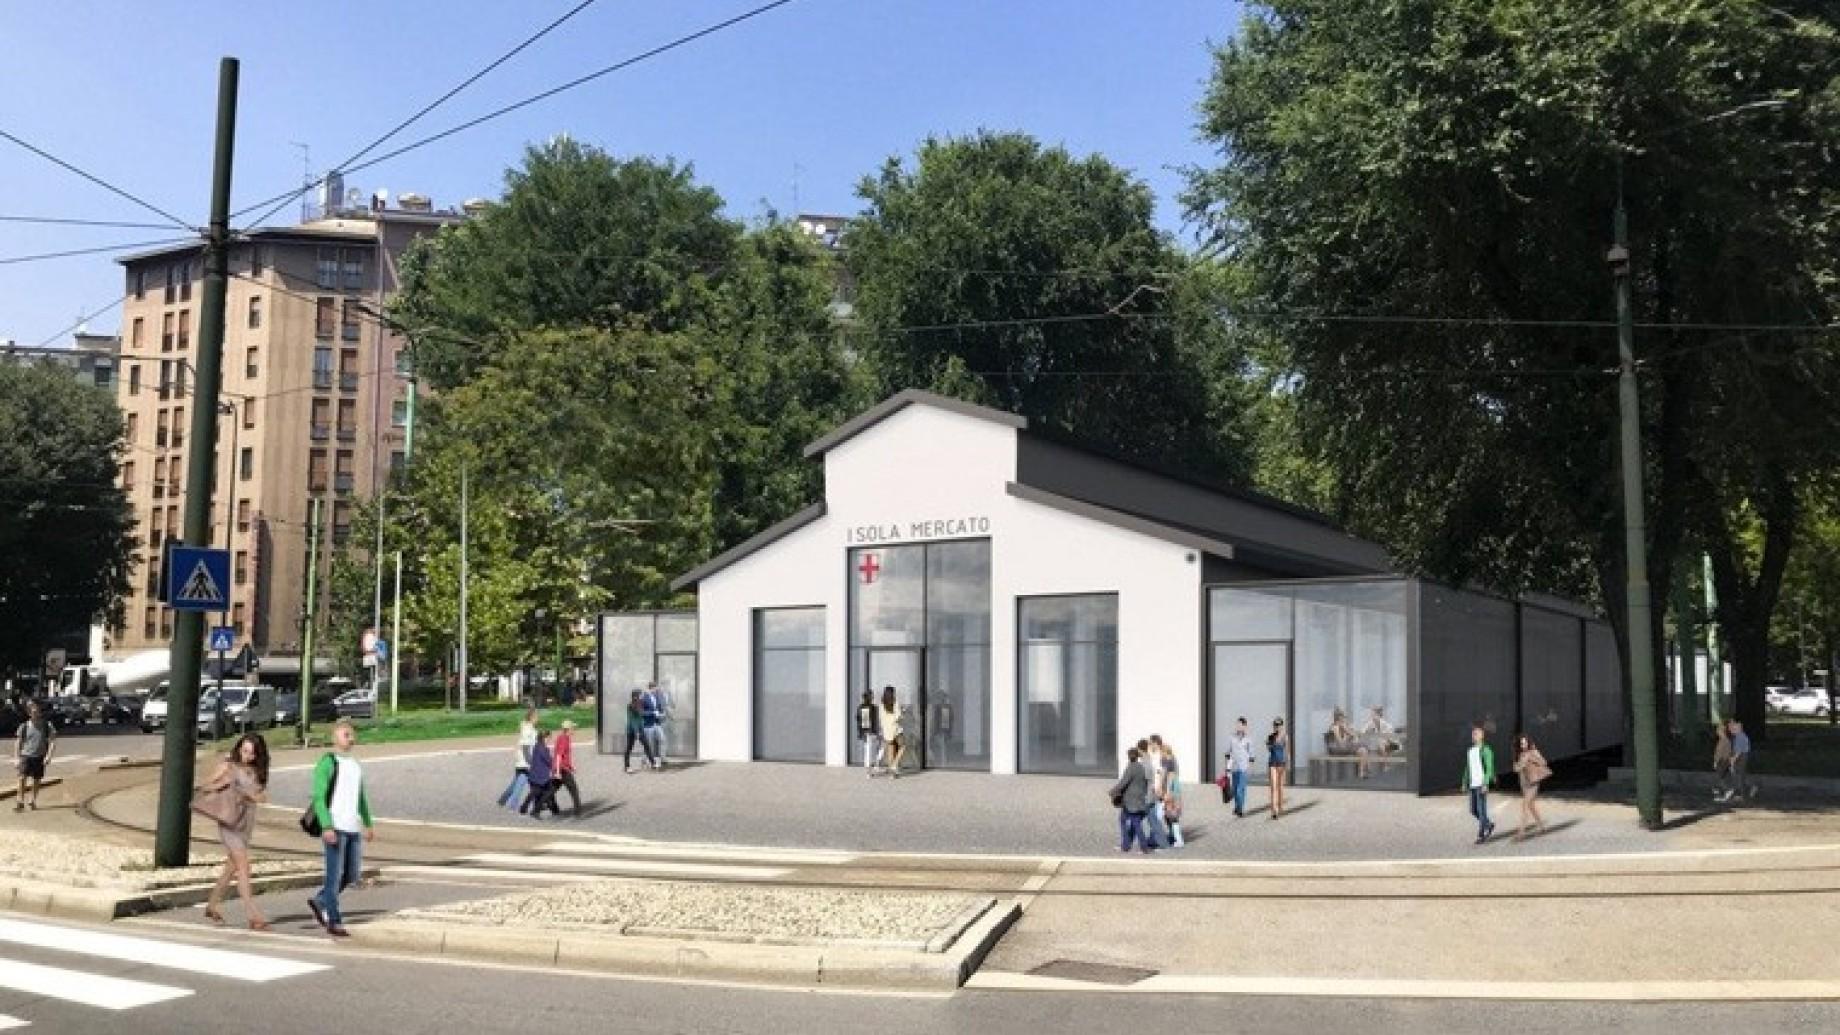 zara-mercato